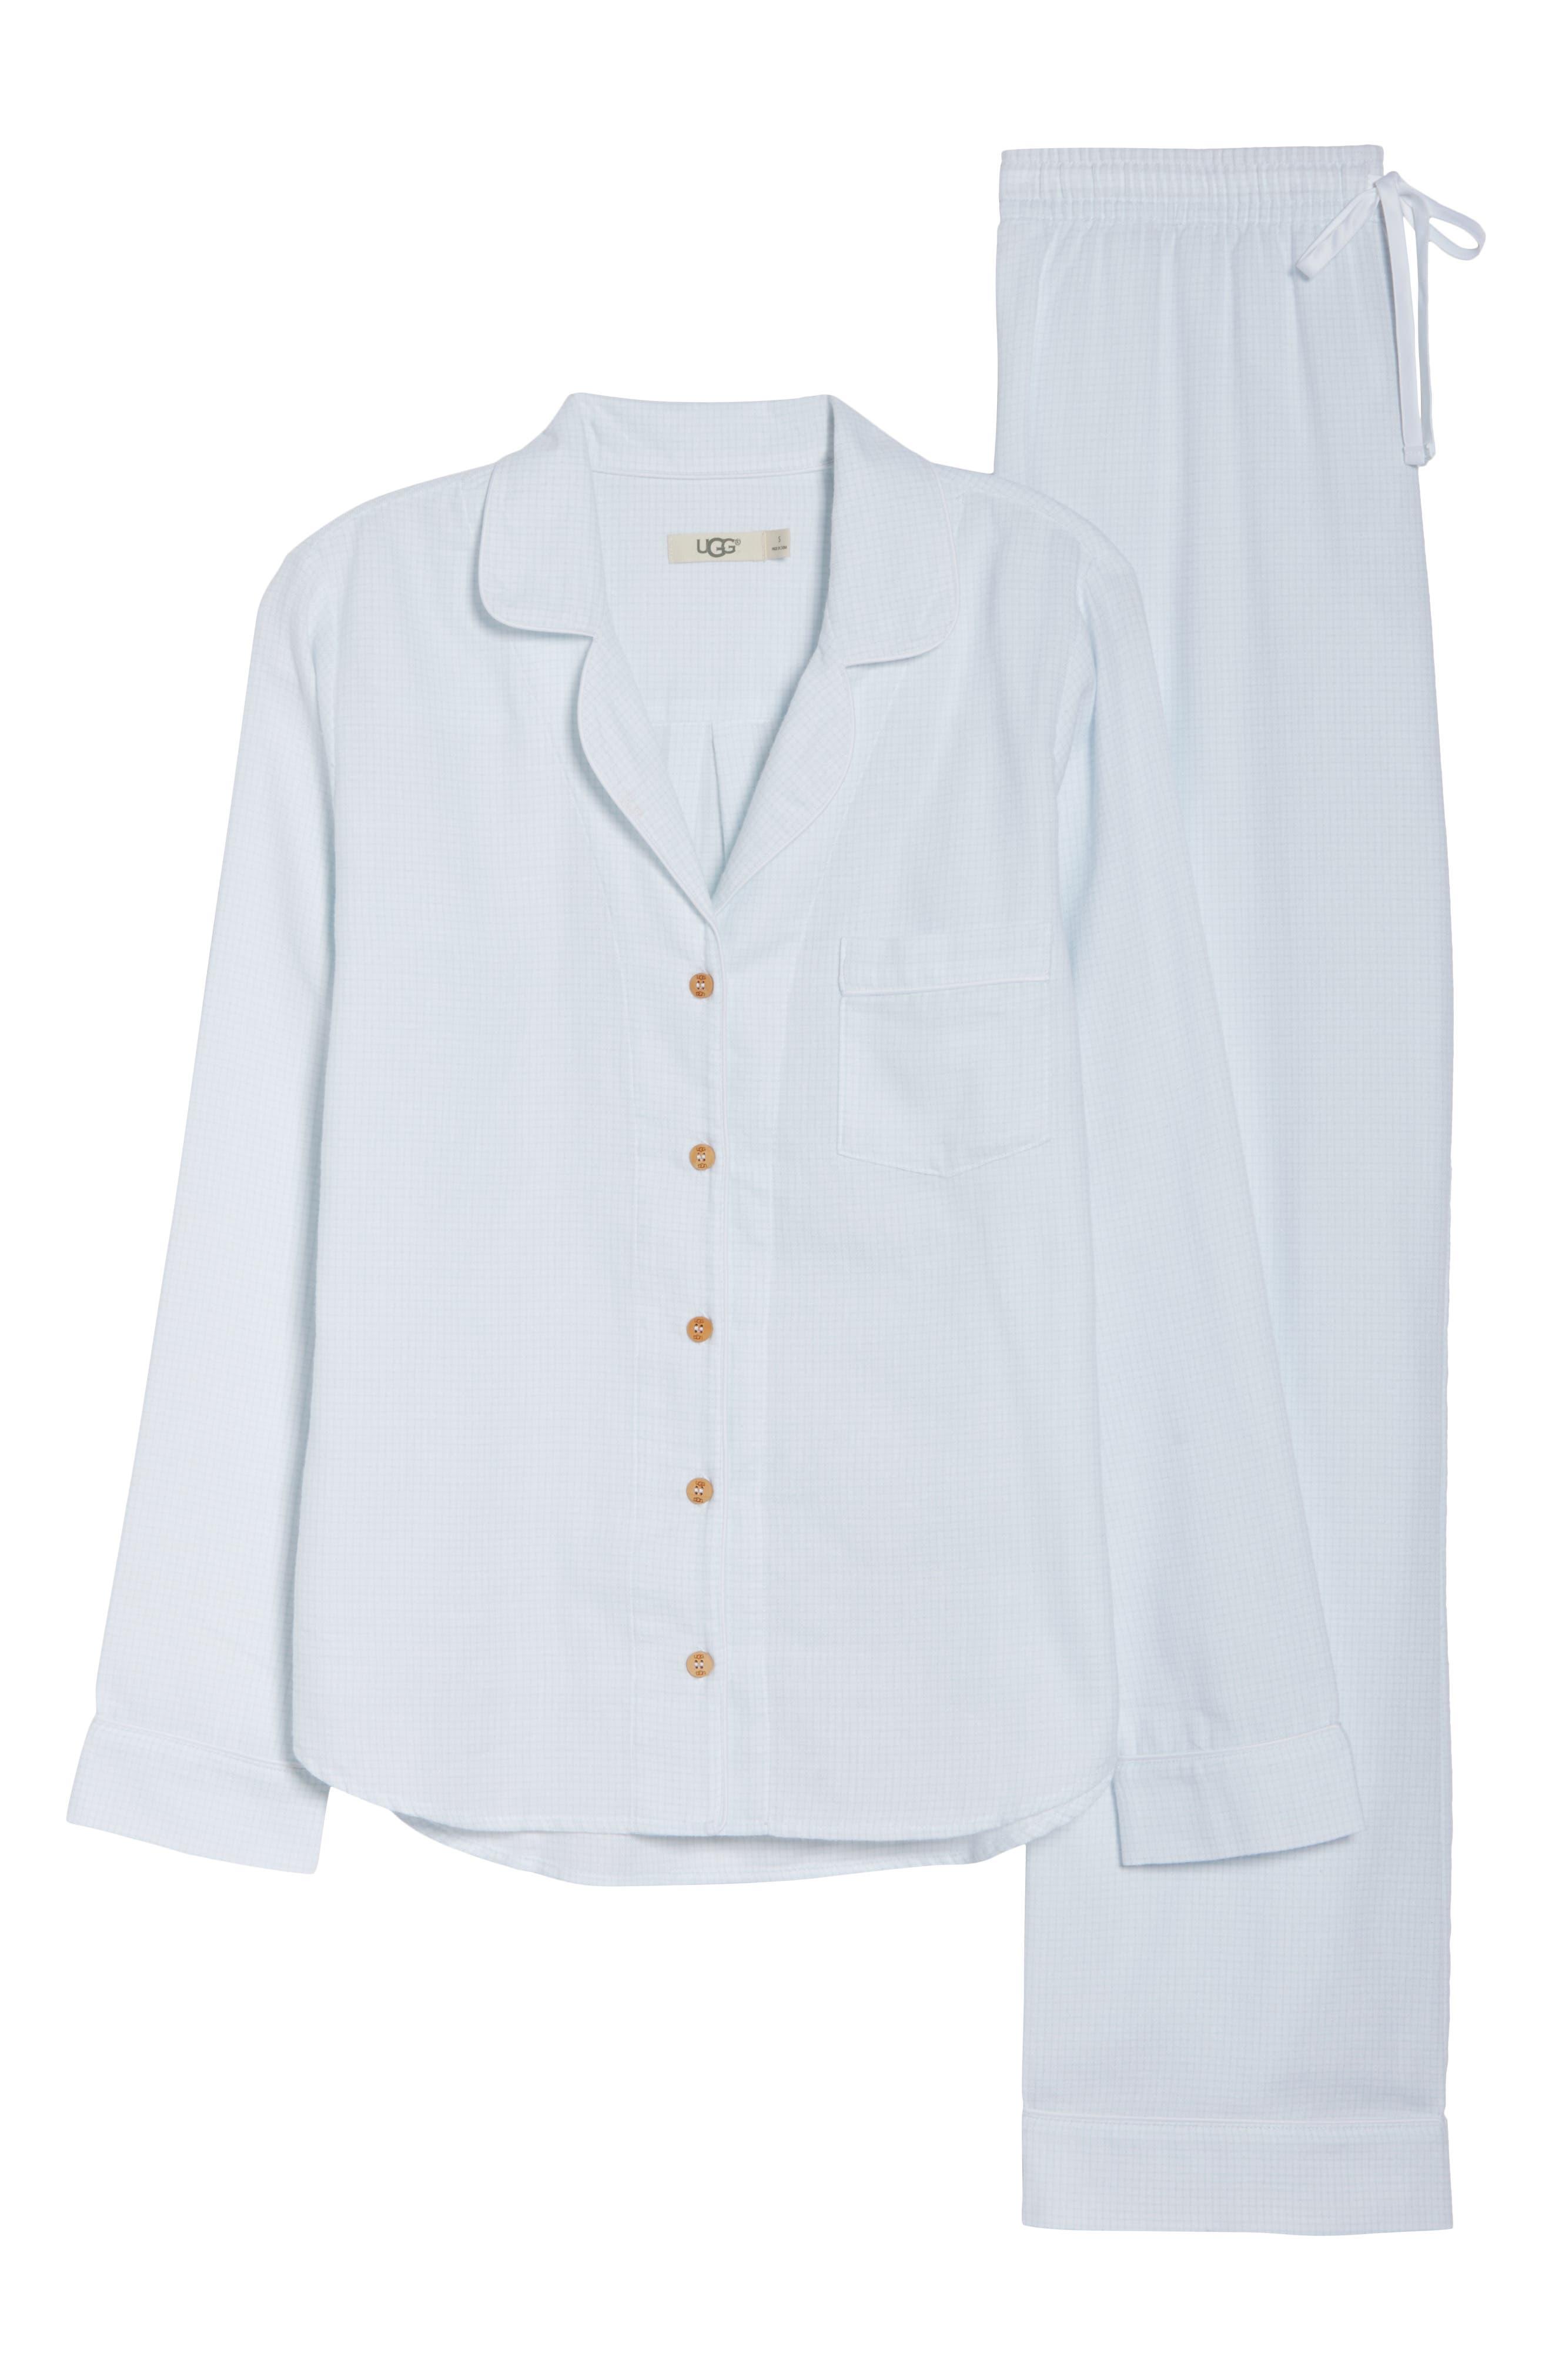 Raven Plaid Pajamas,                             Alternate thumbnail 6, color,                             WHITE / SKY BLUE CHECK